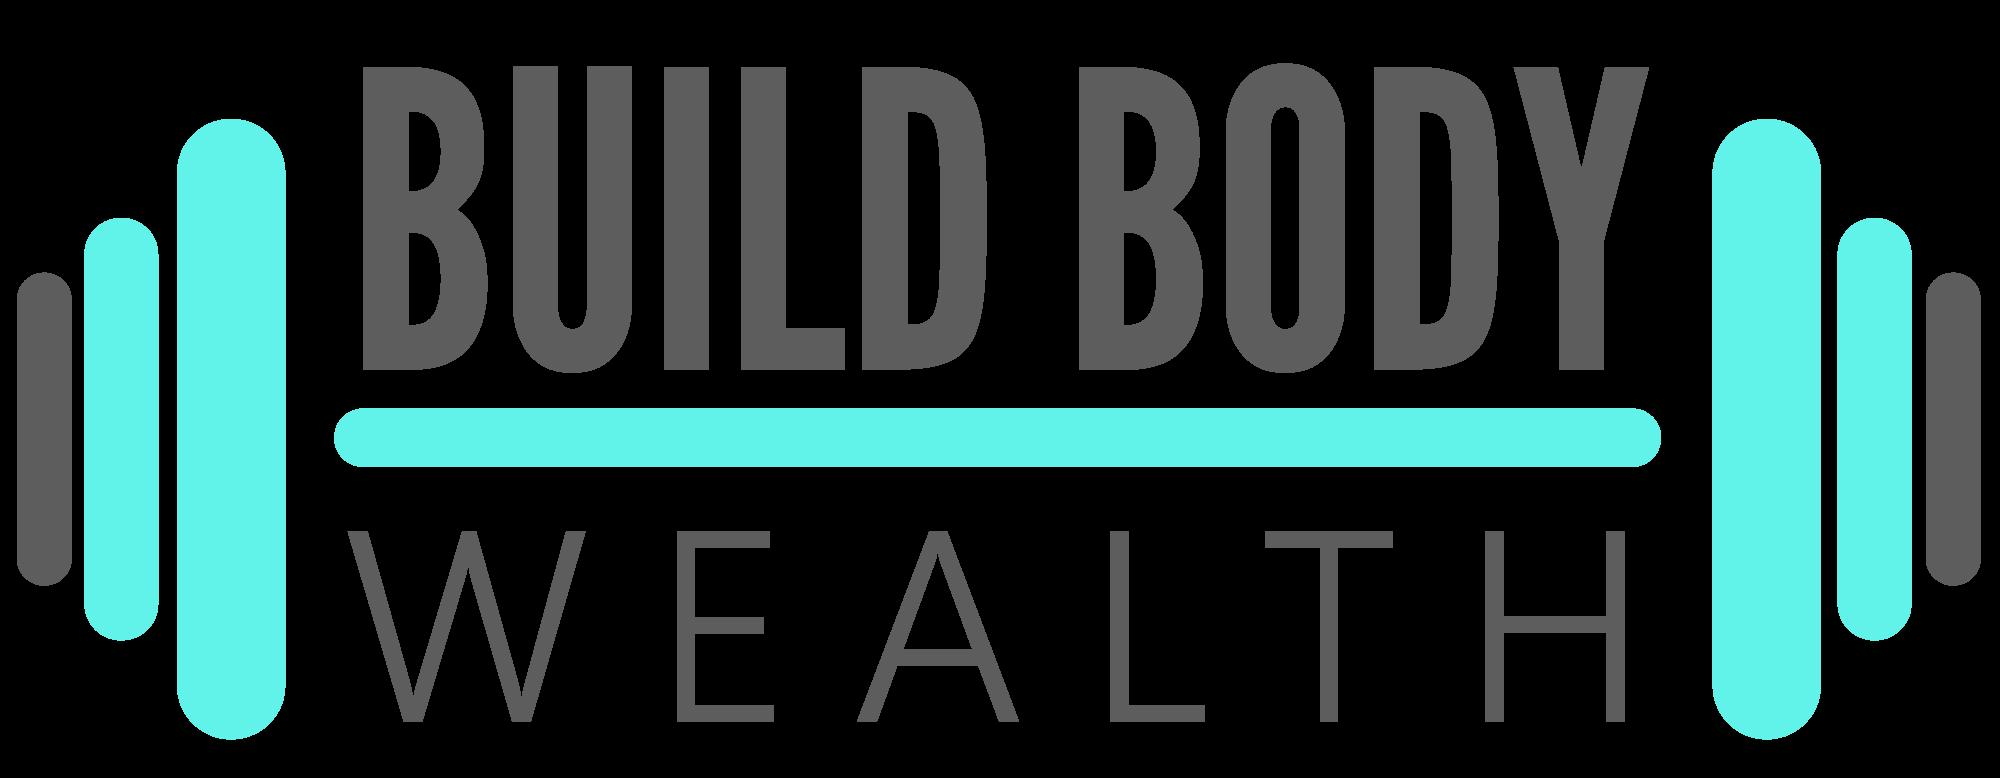 Build Body Wealth Lifestyle